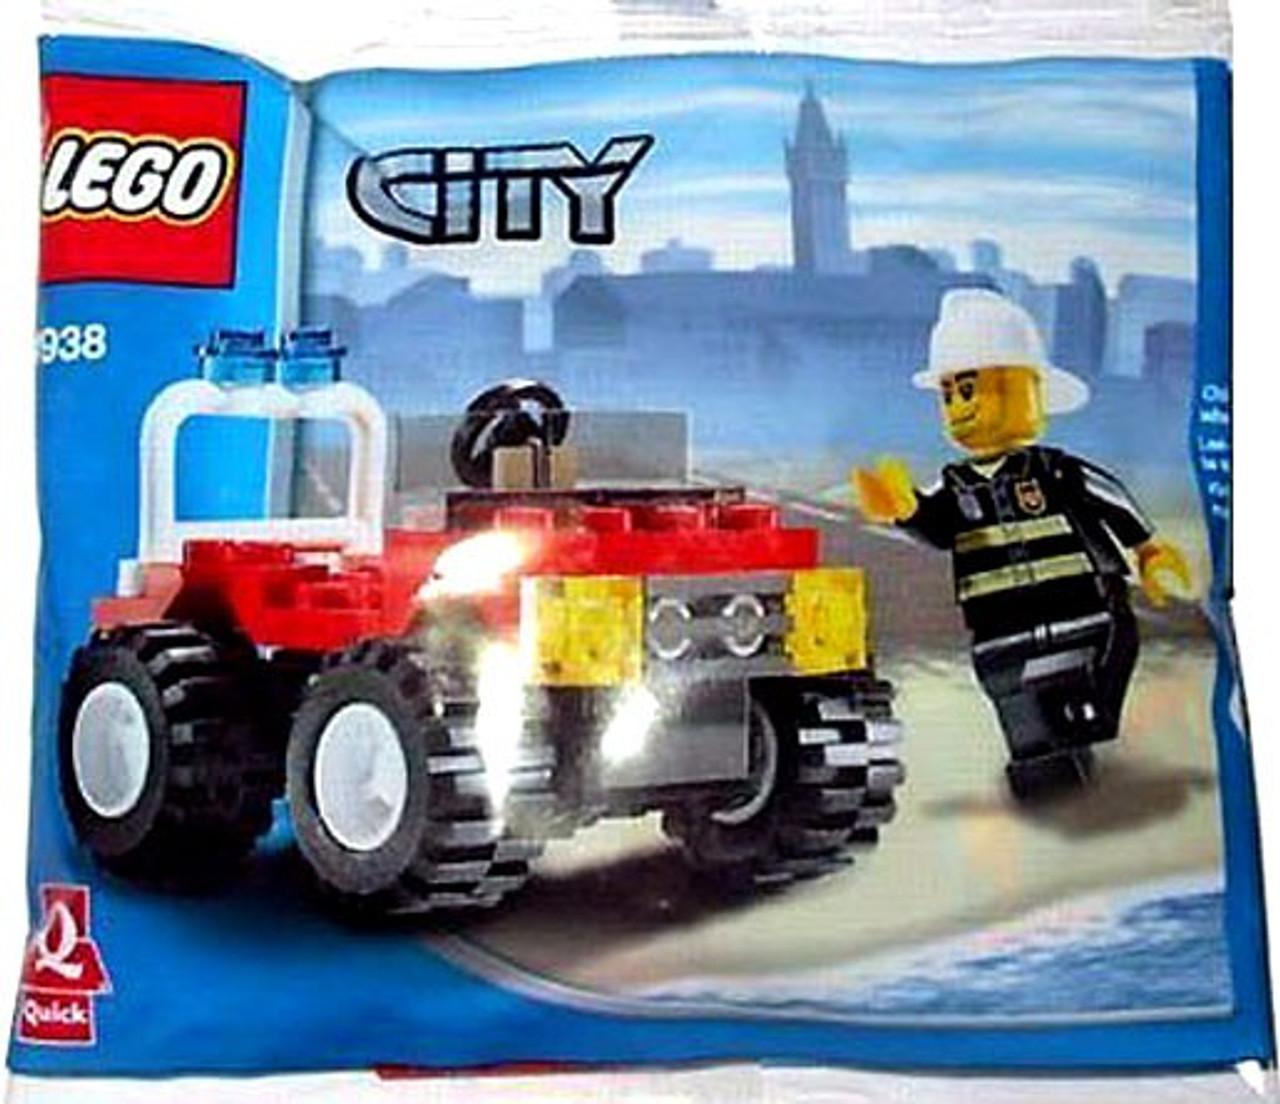 LEGO City Fire 4x4 Set #4938